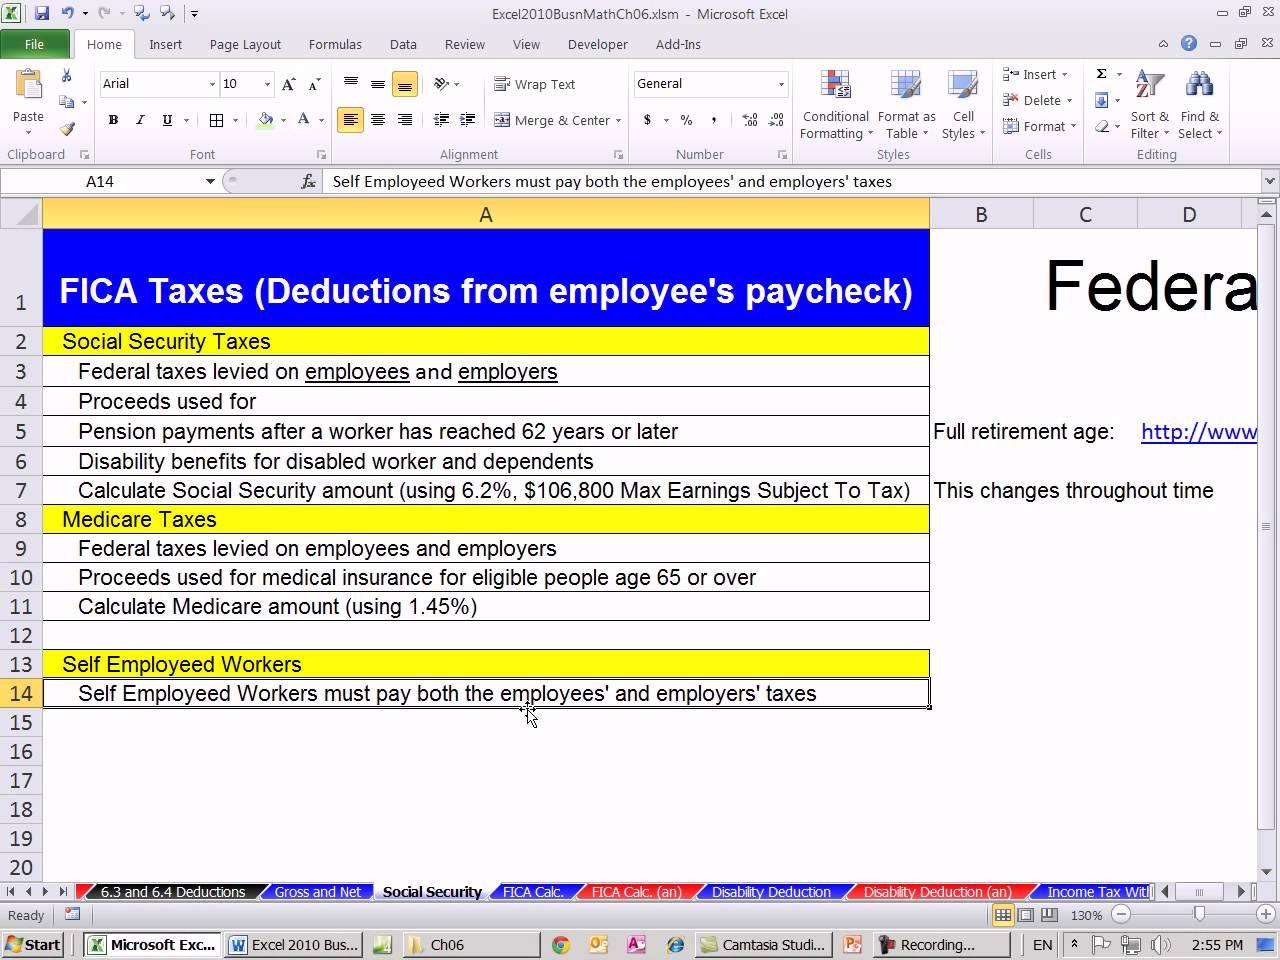 Worksheets Social Security Benefits Worksheet Calculator social security benefit calculator excel spreadsheet daway dabrowa co spreadsheet